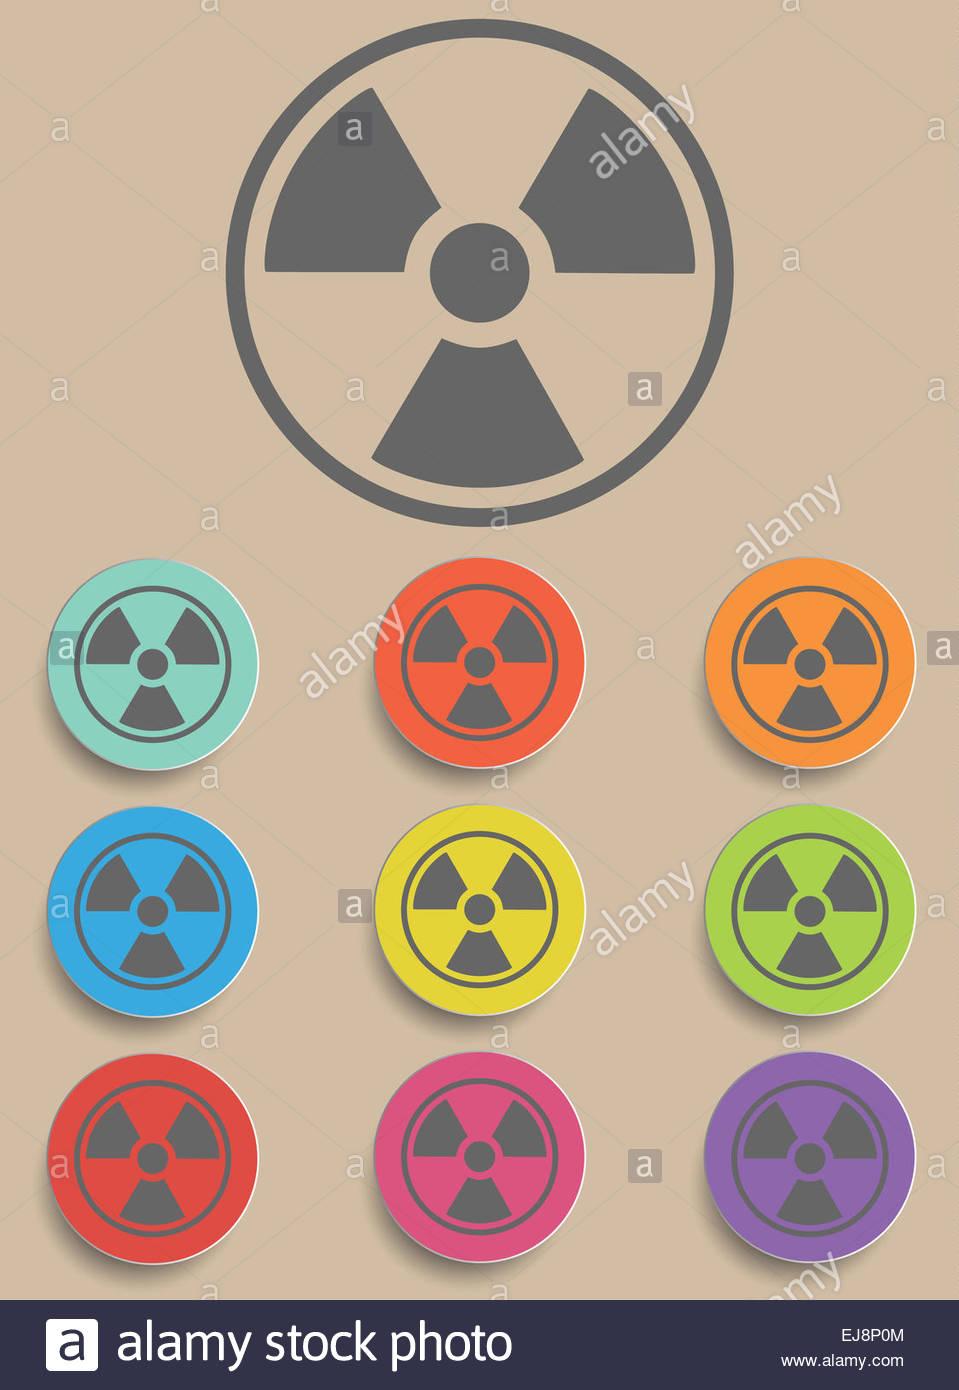 Radiation sign - Illustration Stock Photo